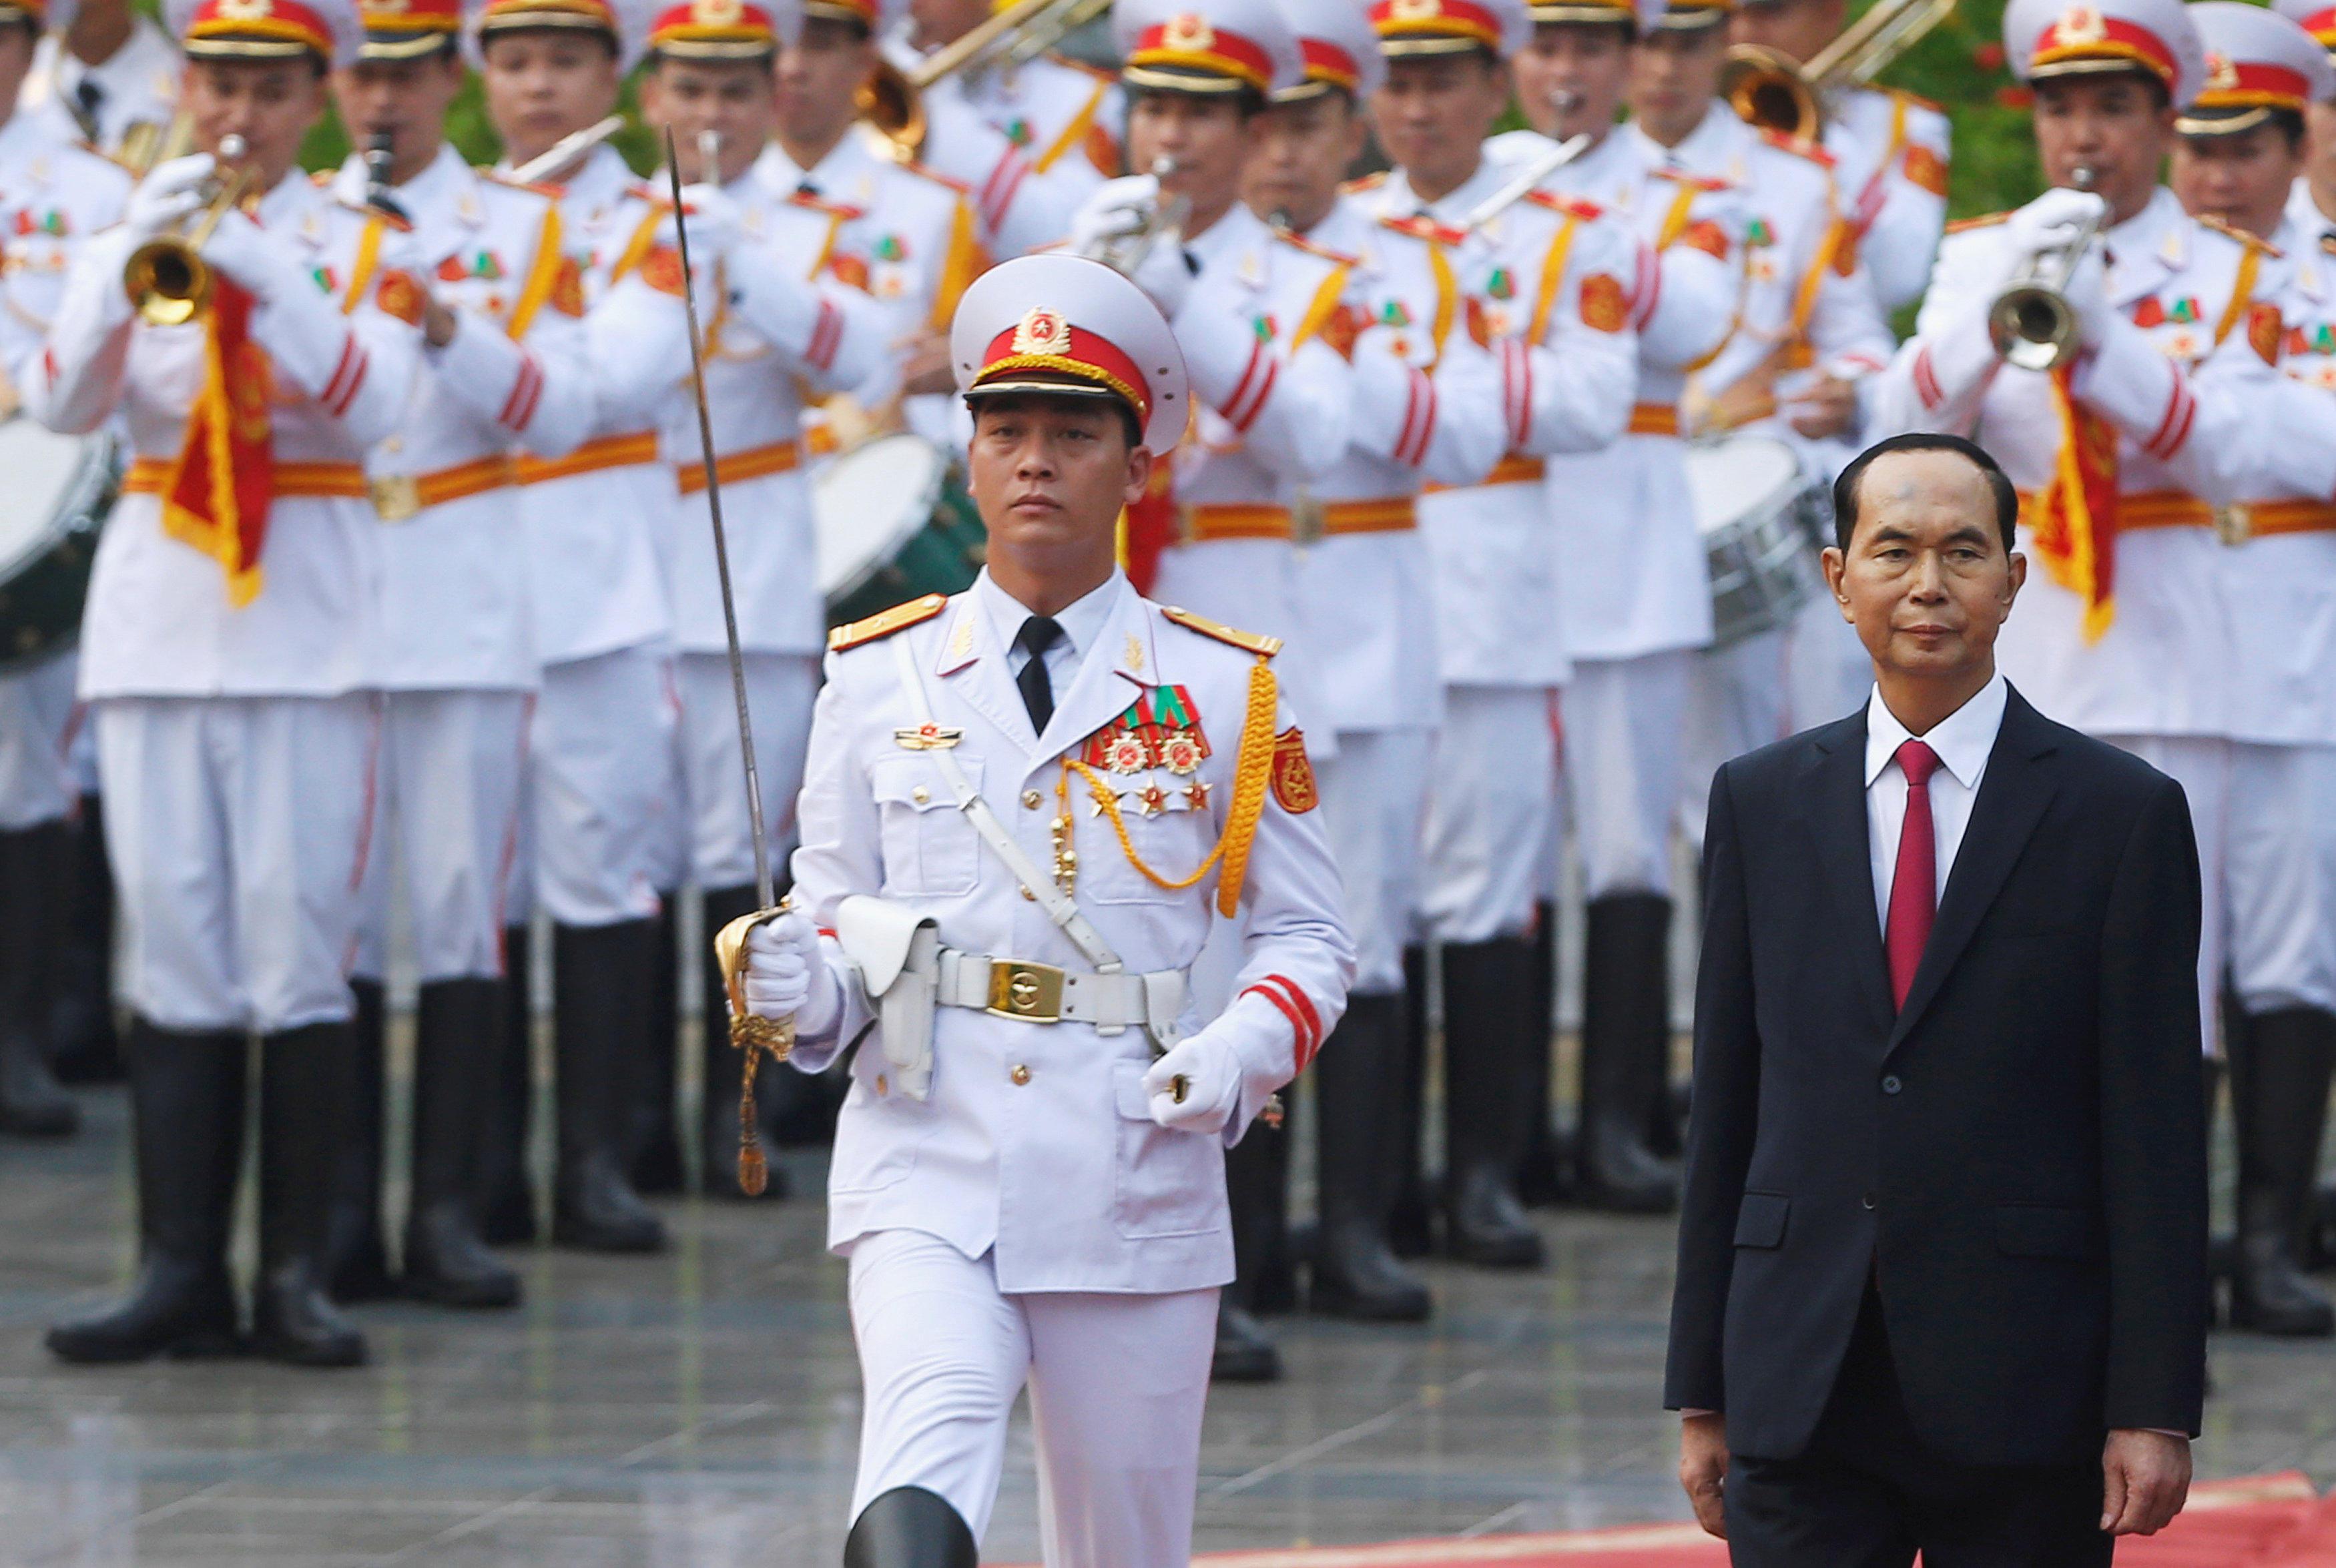 Vietnam President Tran Dai Quang Dead At 61, Communist Party Confirms